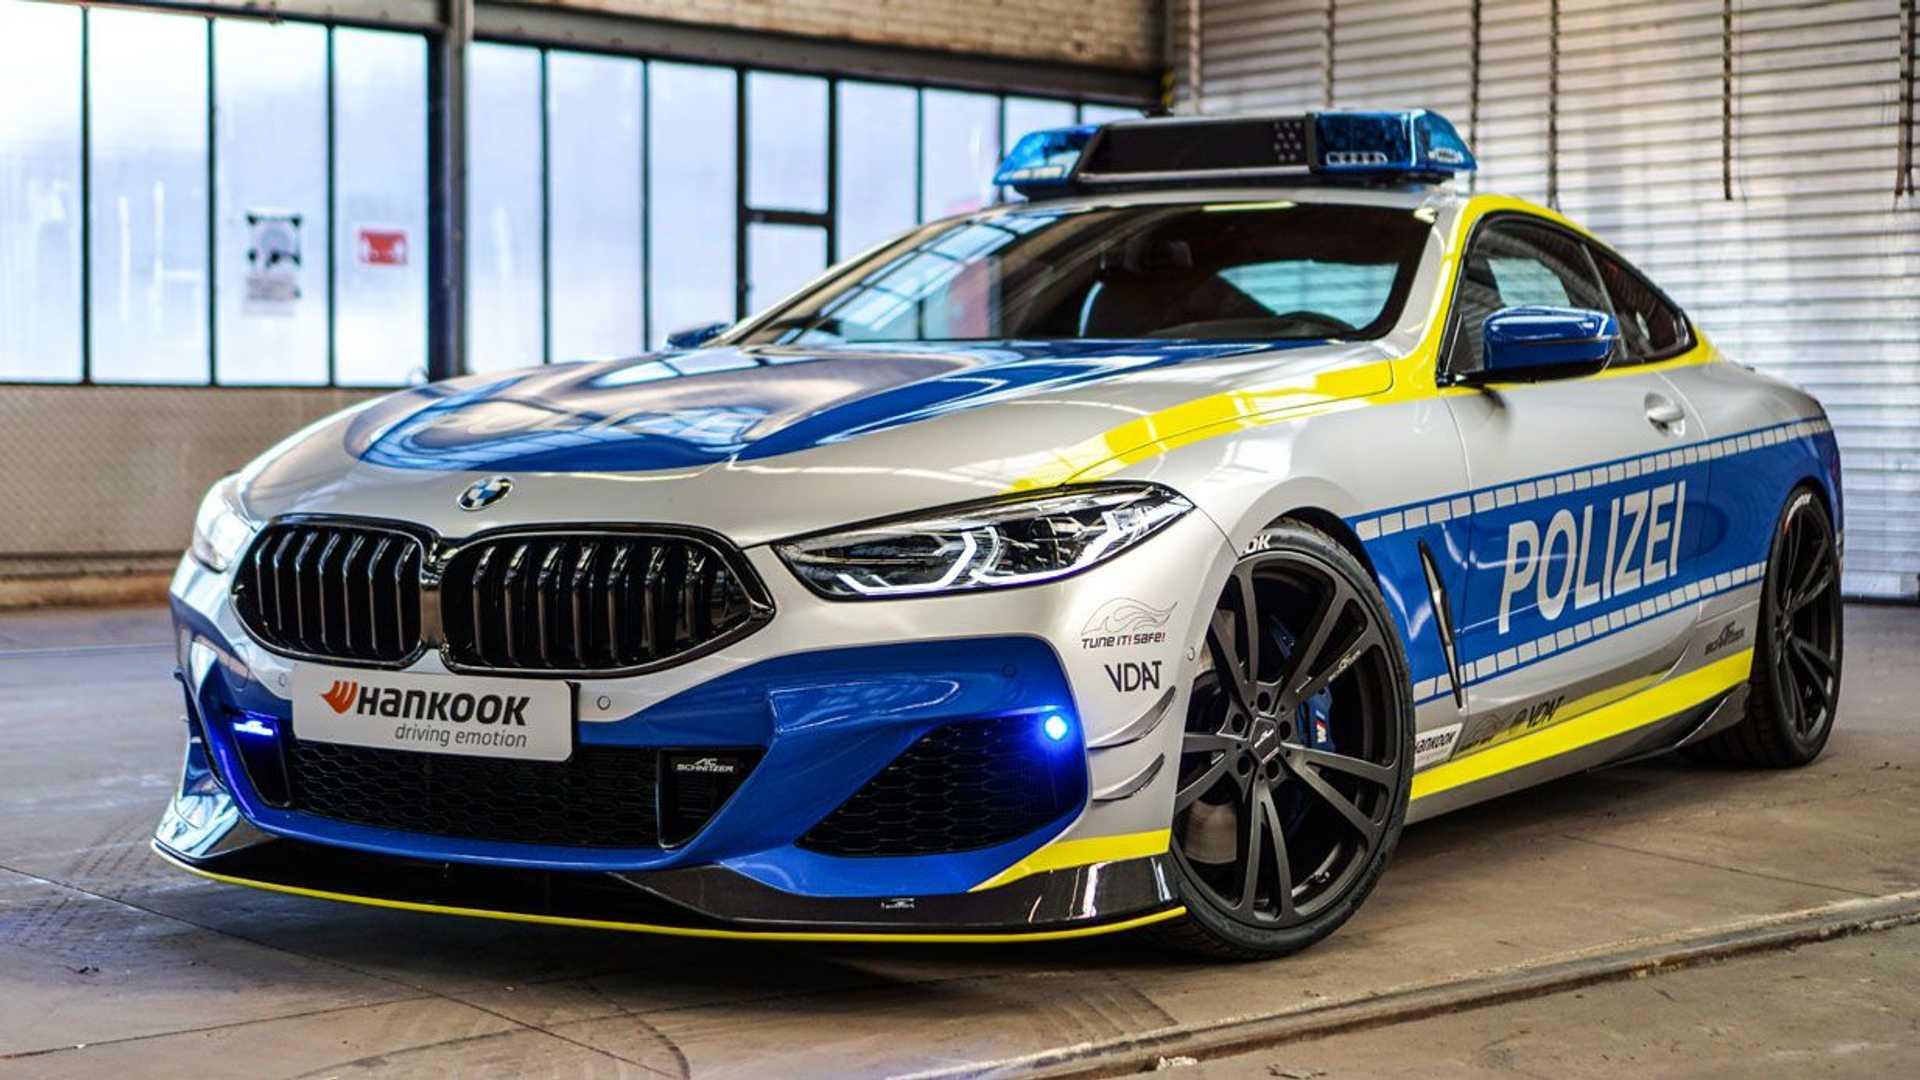 BMW-M850i-police-car-tune-it-safe-14